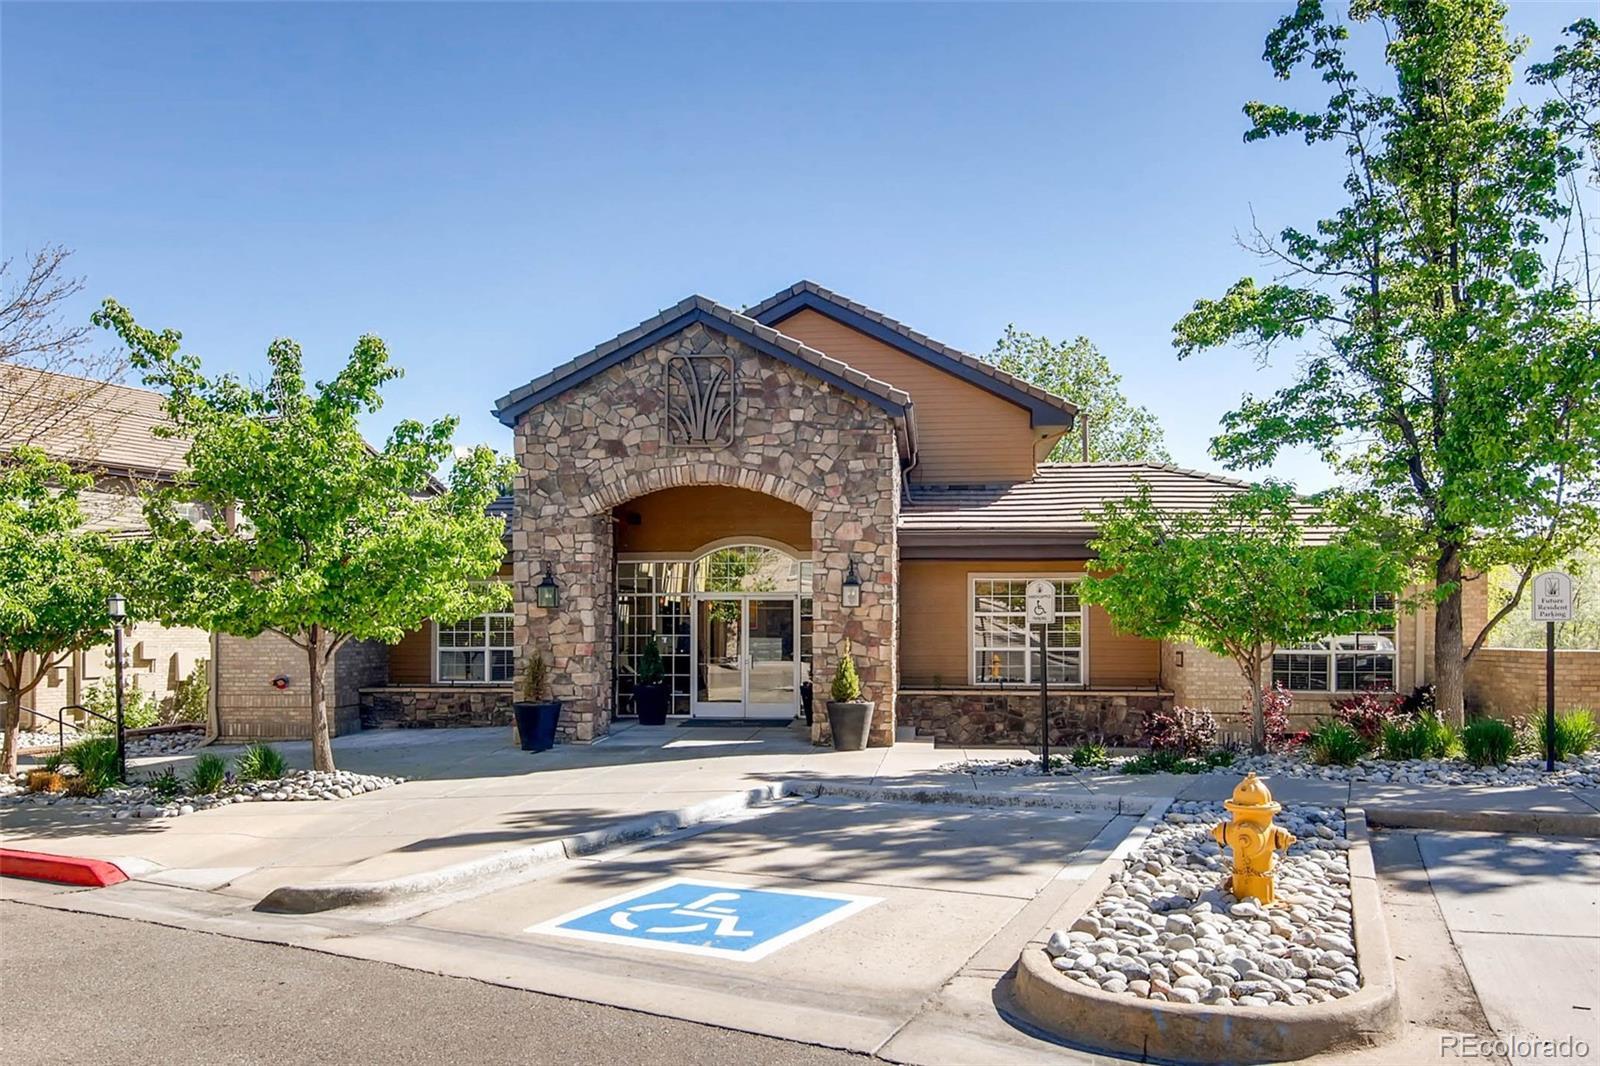 MLS# 2024002 - 12 - 5455 Landmark Place #603, Greenwood Village, CO 80111